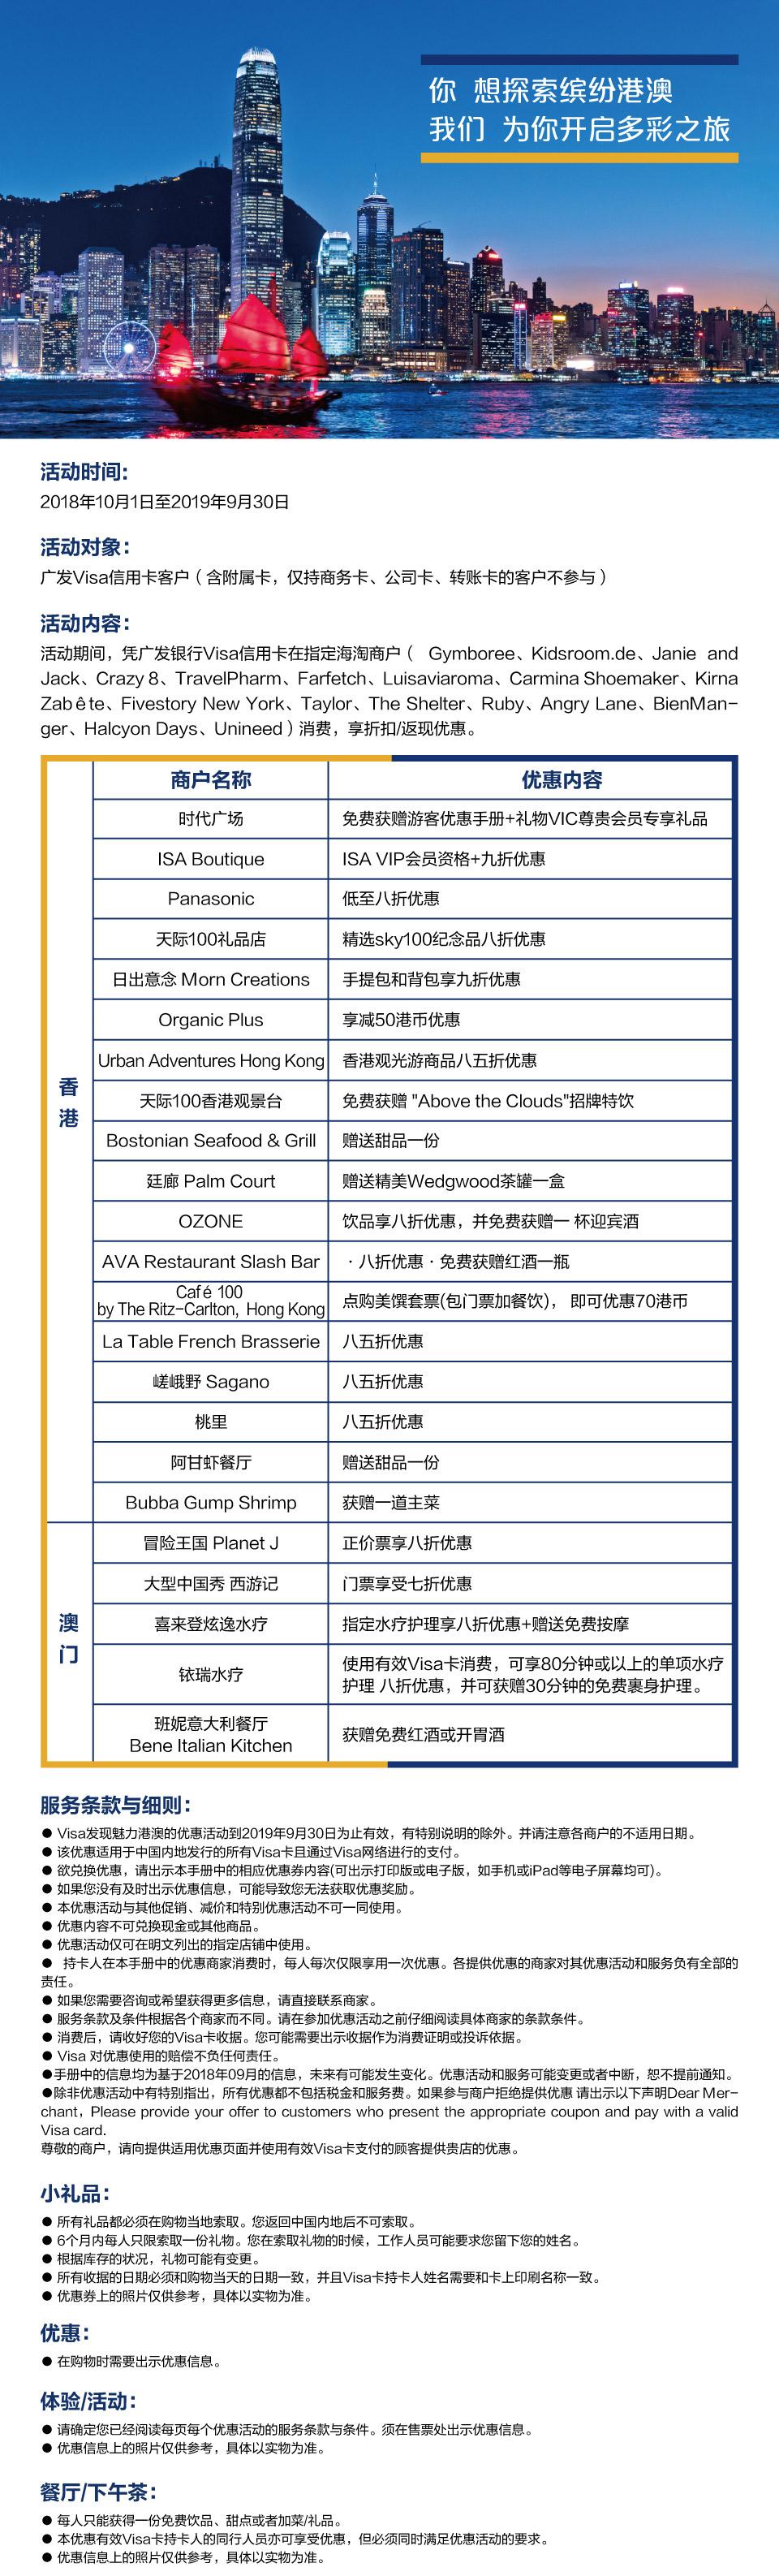 Visa发现魅力港澳 2018-2019